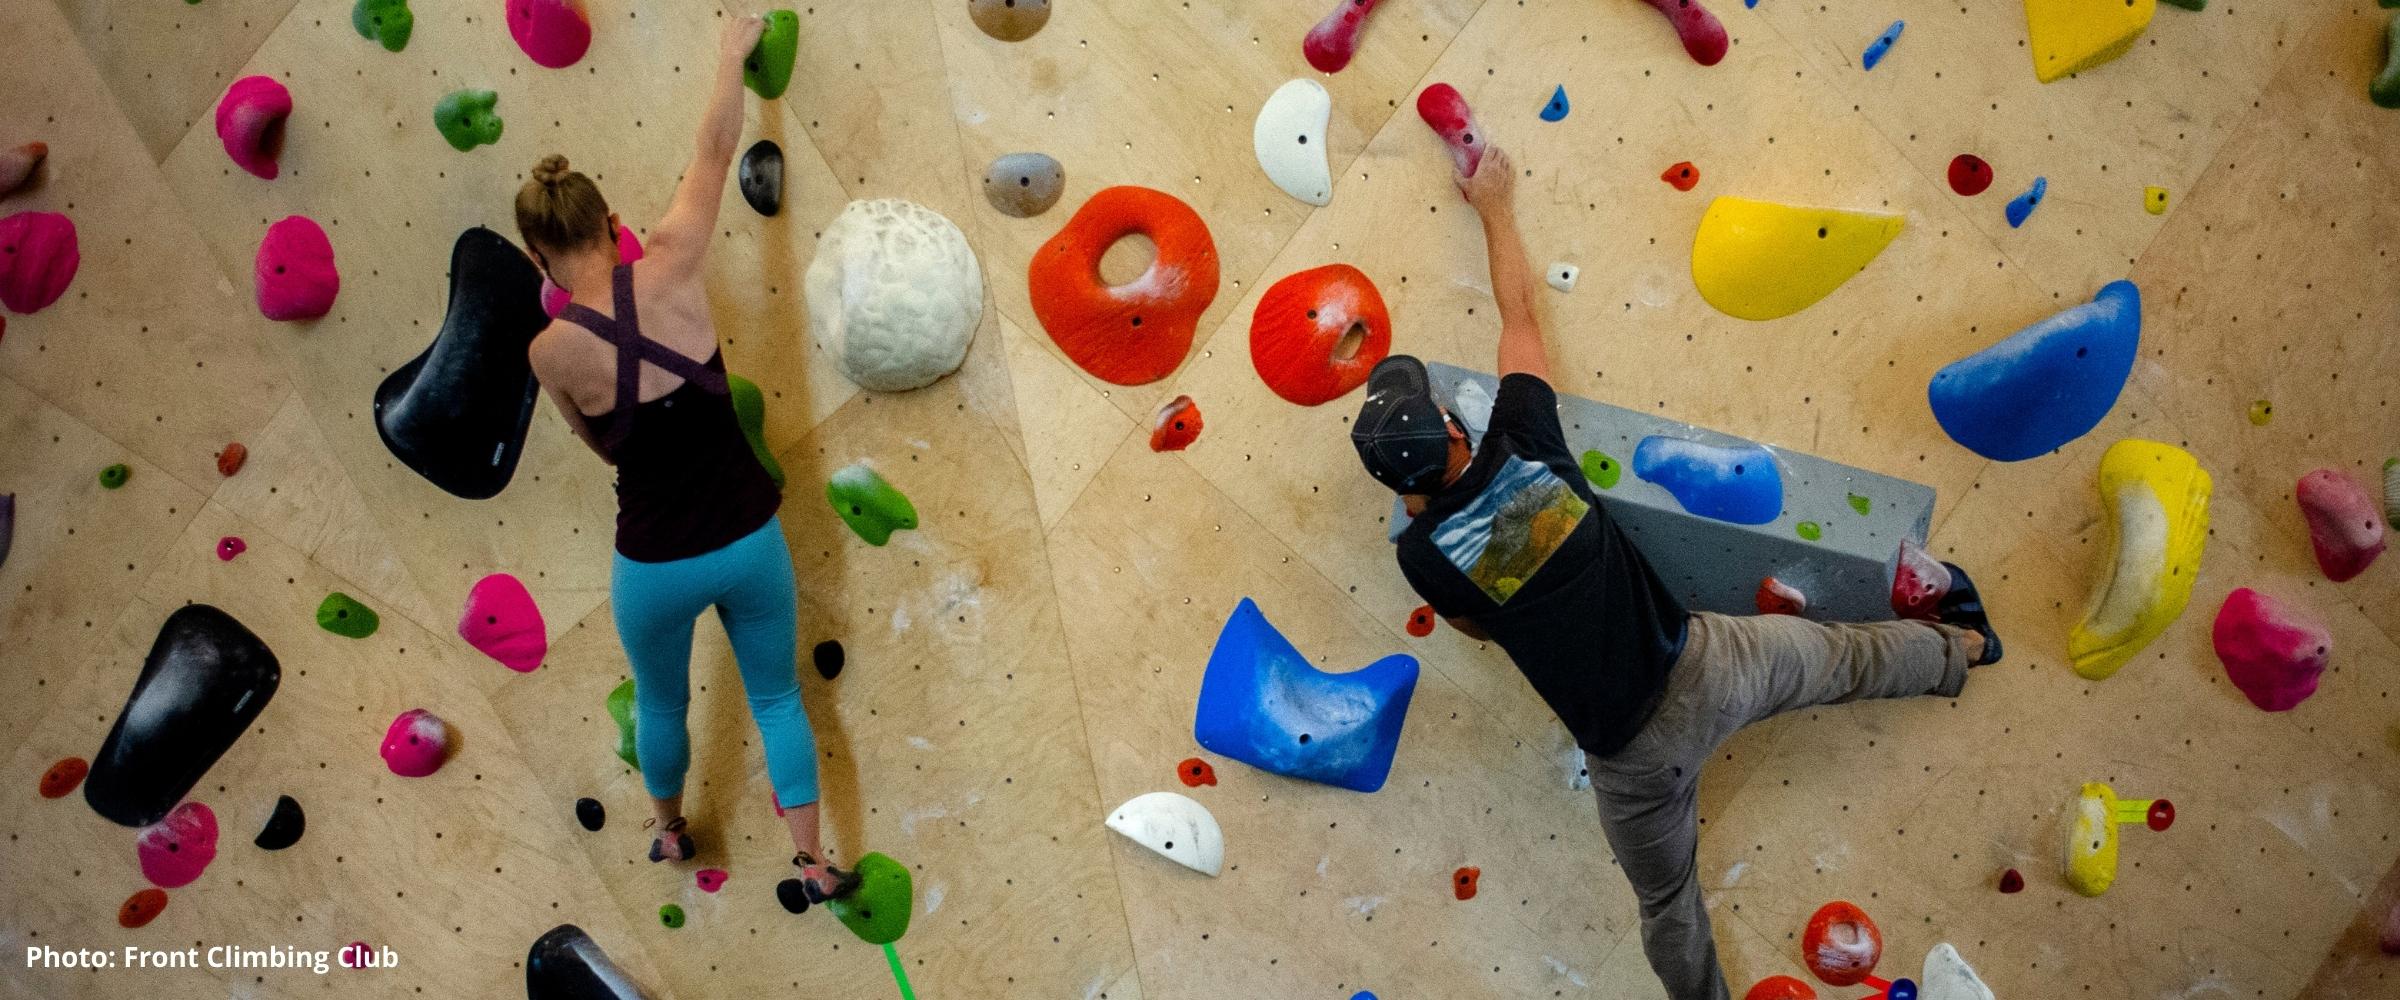 Climbers traversing a bouldering wall